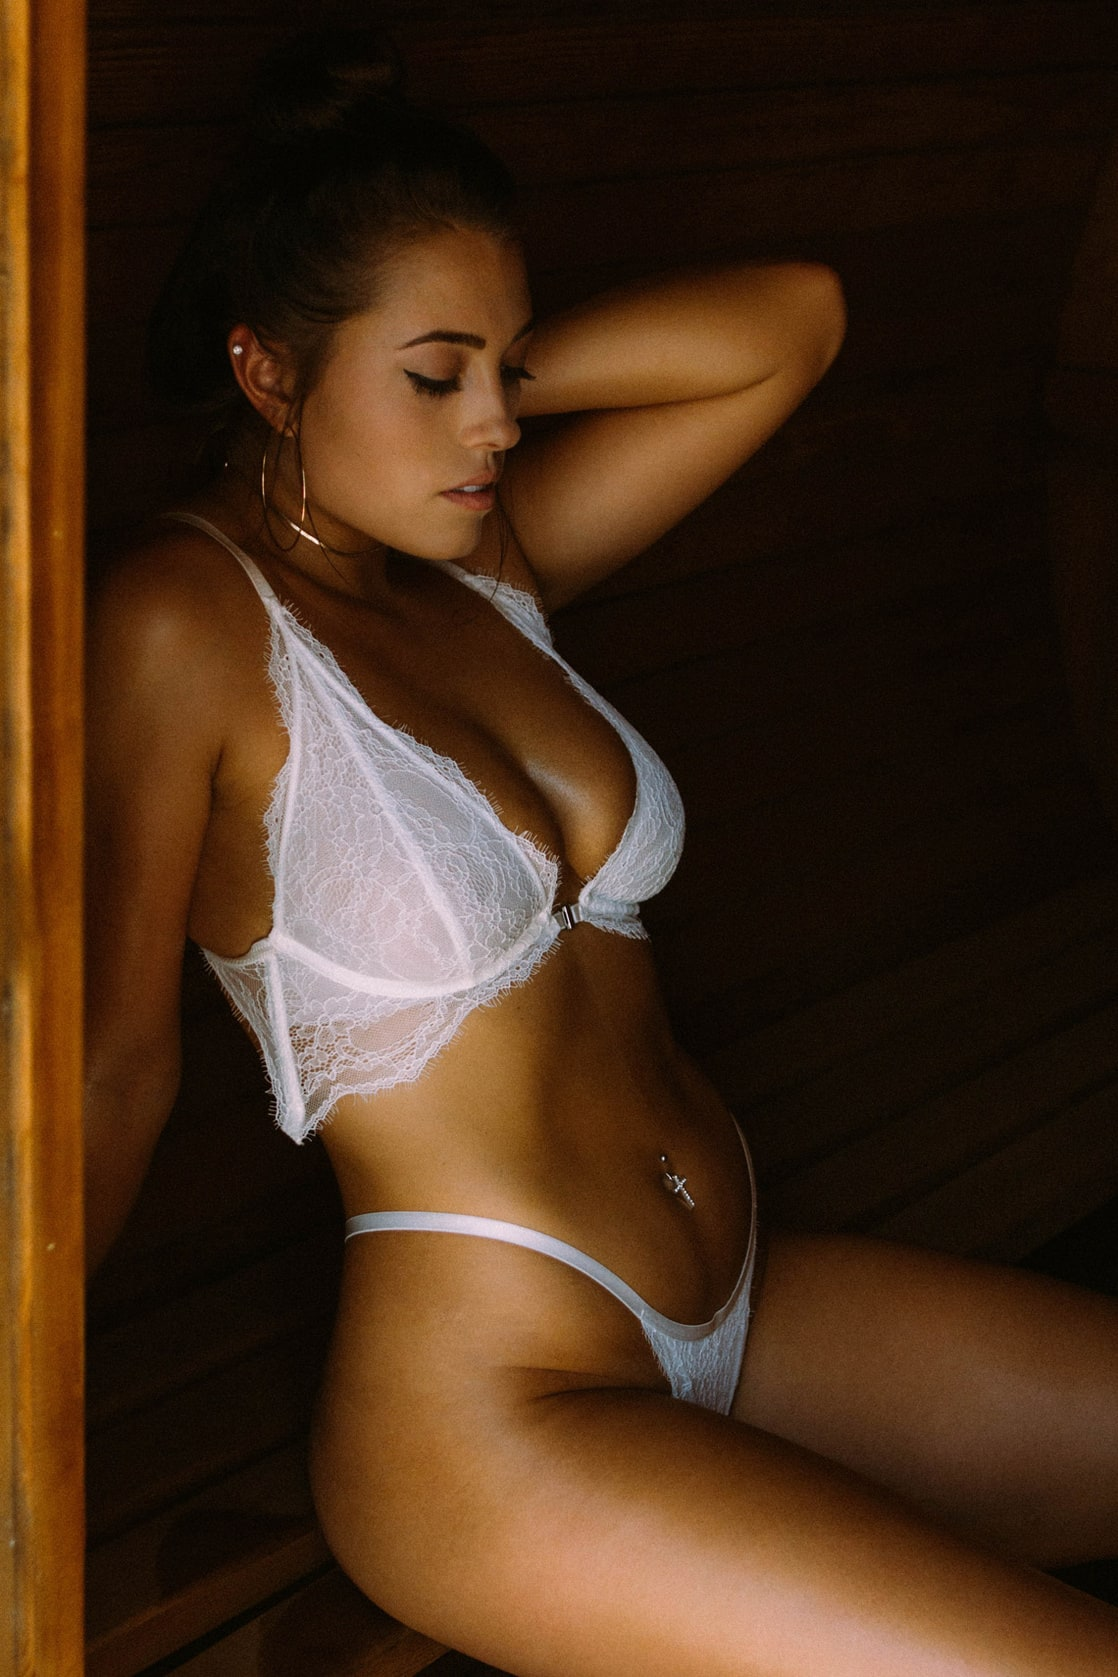 Laurel Witt nudes (26 photos), Ass, Bikini, Instagram, cleavage 2015